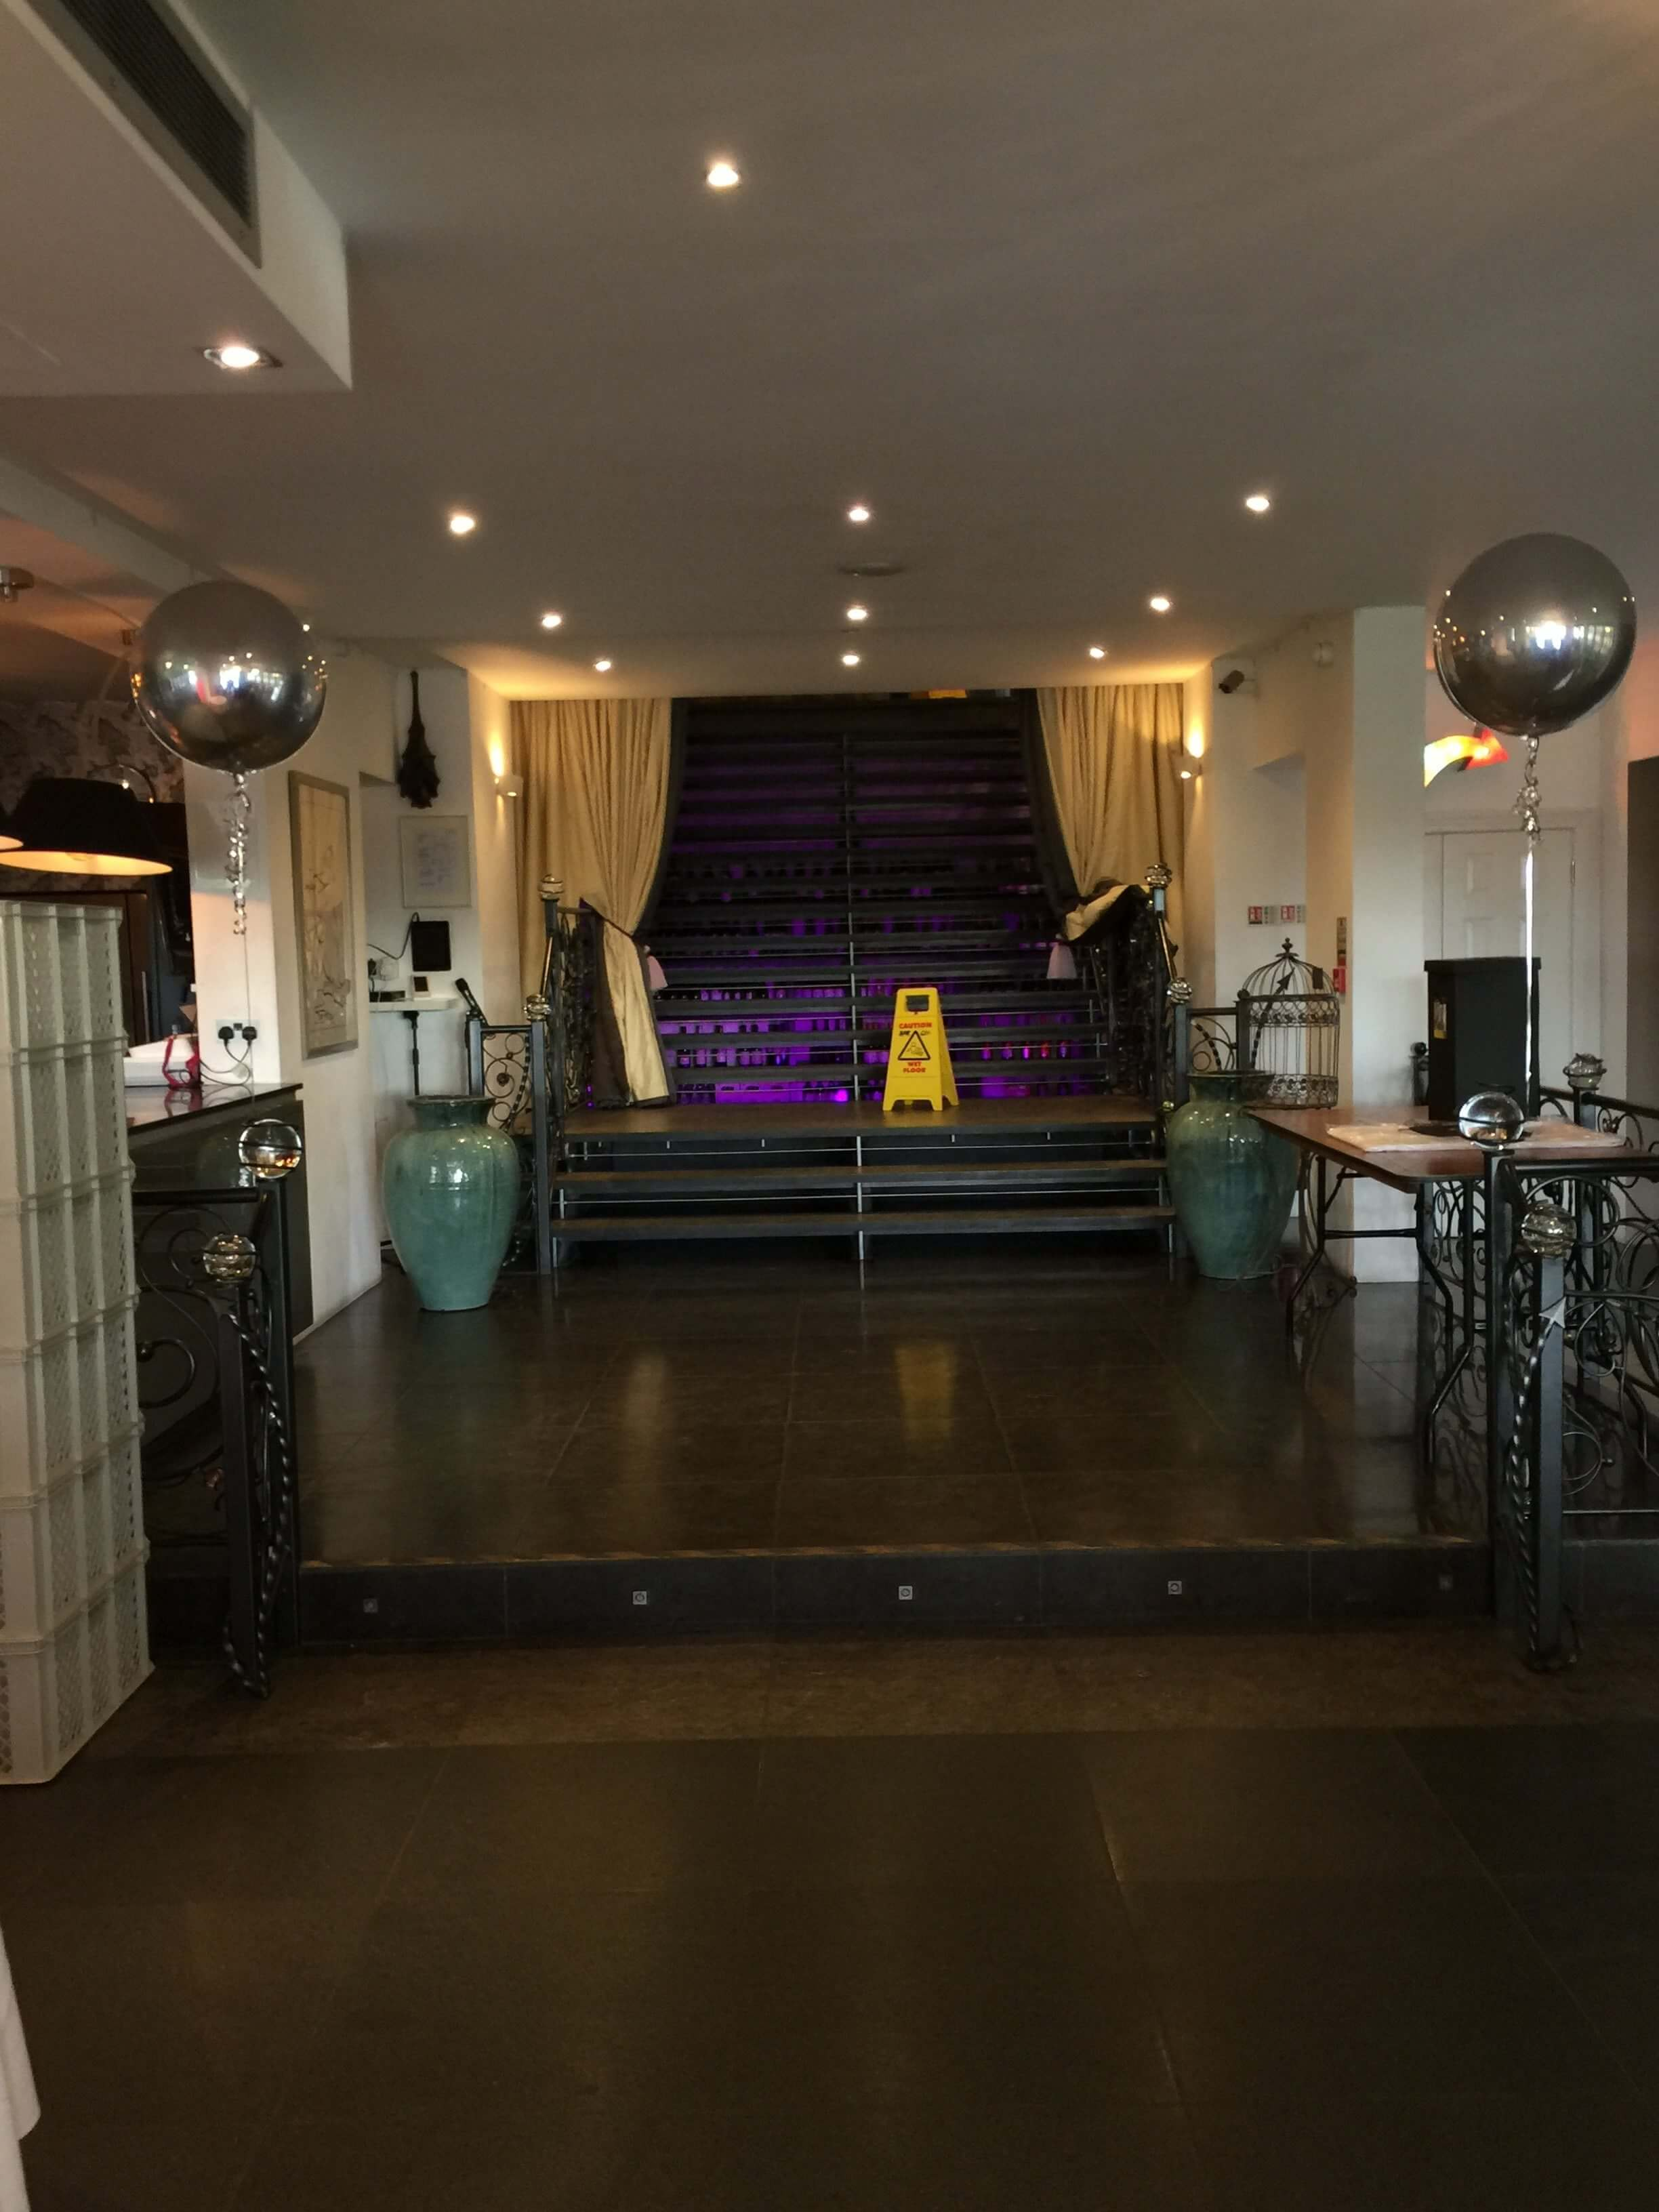 Silver Round Orbz Balloons at a Wedding Venue